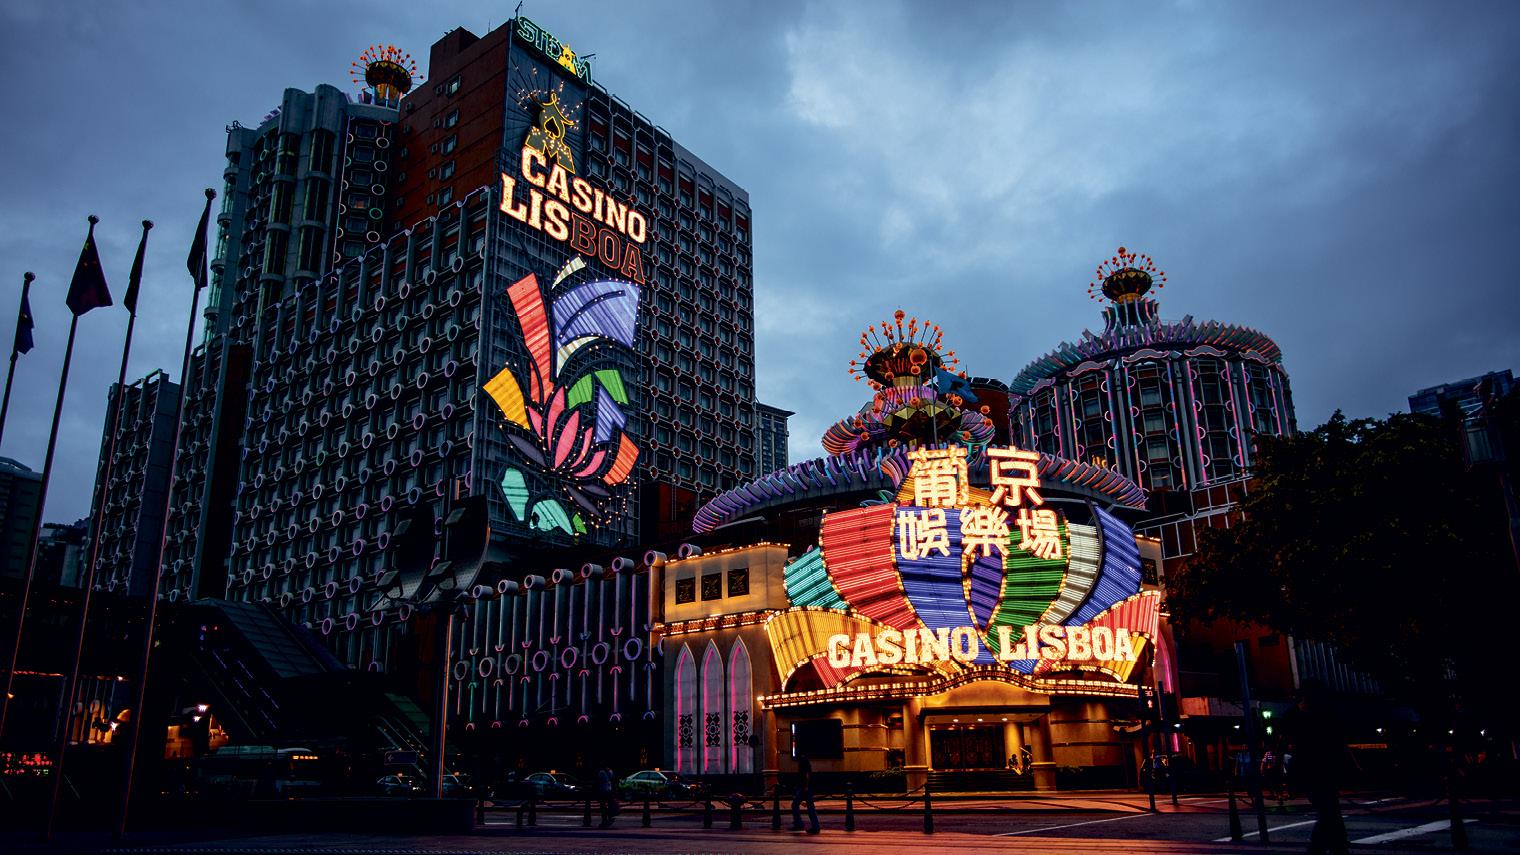 Chinese gambling city casino great online payouts slot